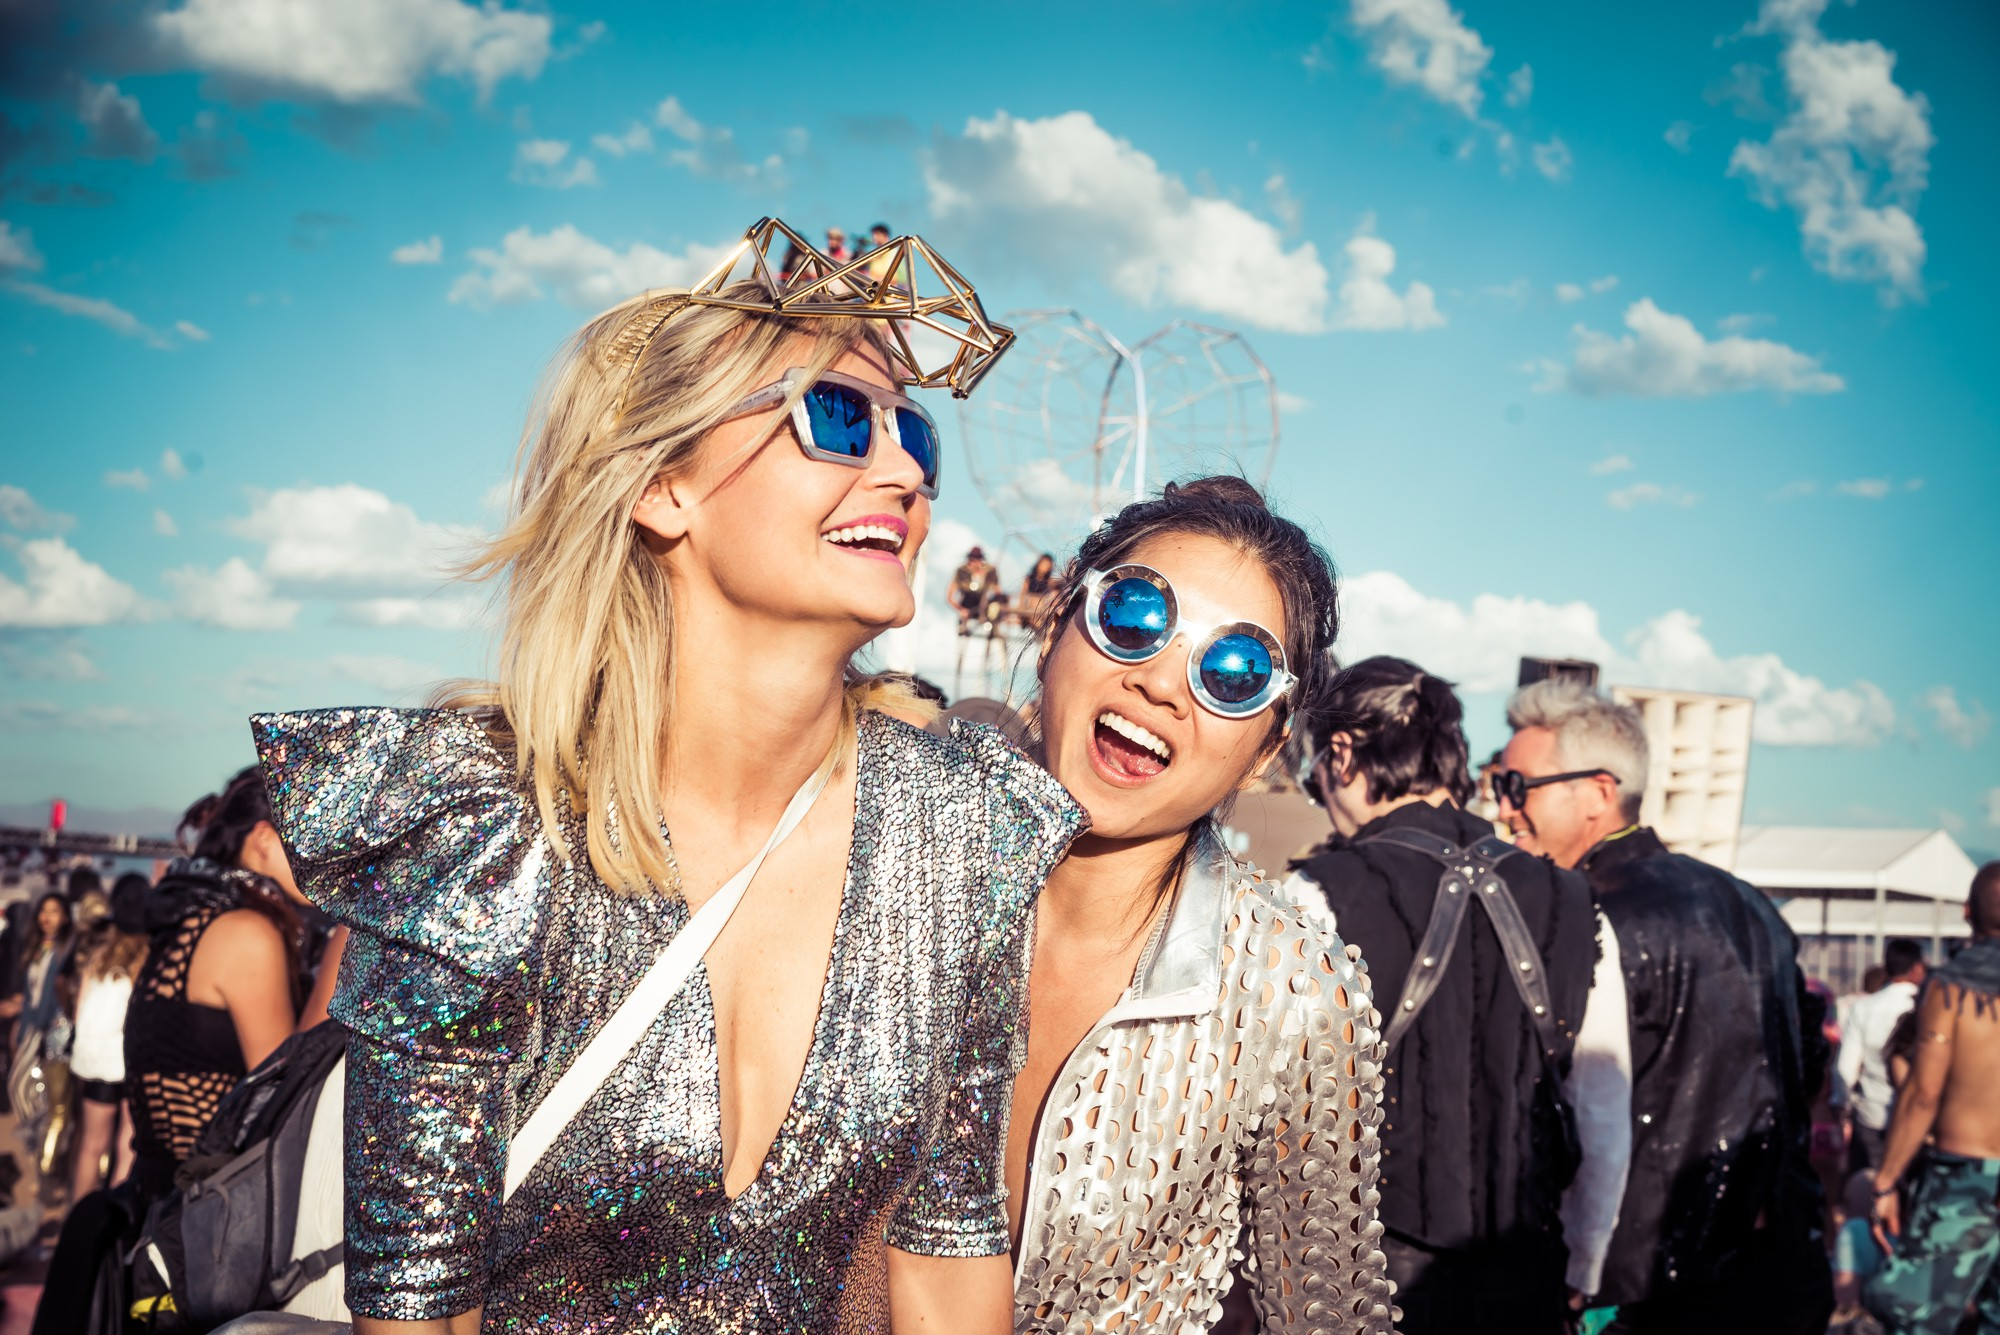 HUNGER TV - Fashion, Beauty, Music, Photograpy, Art Art fashion music culture